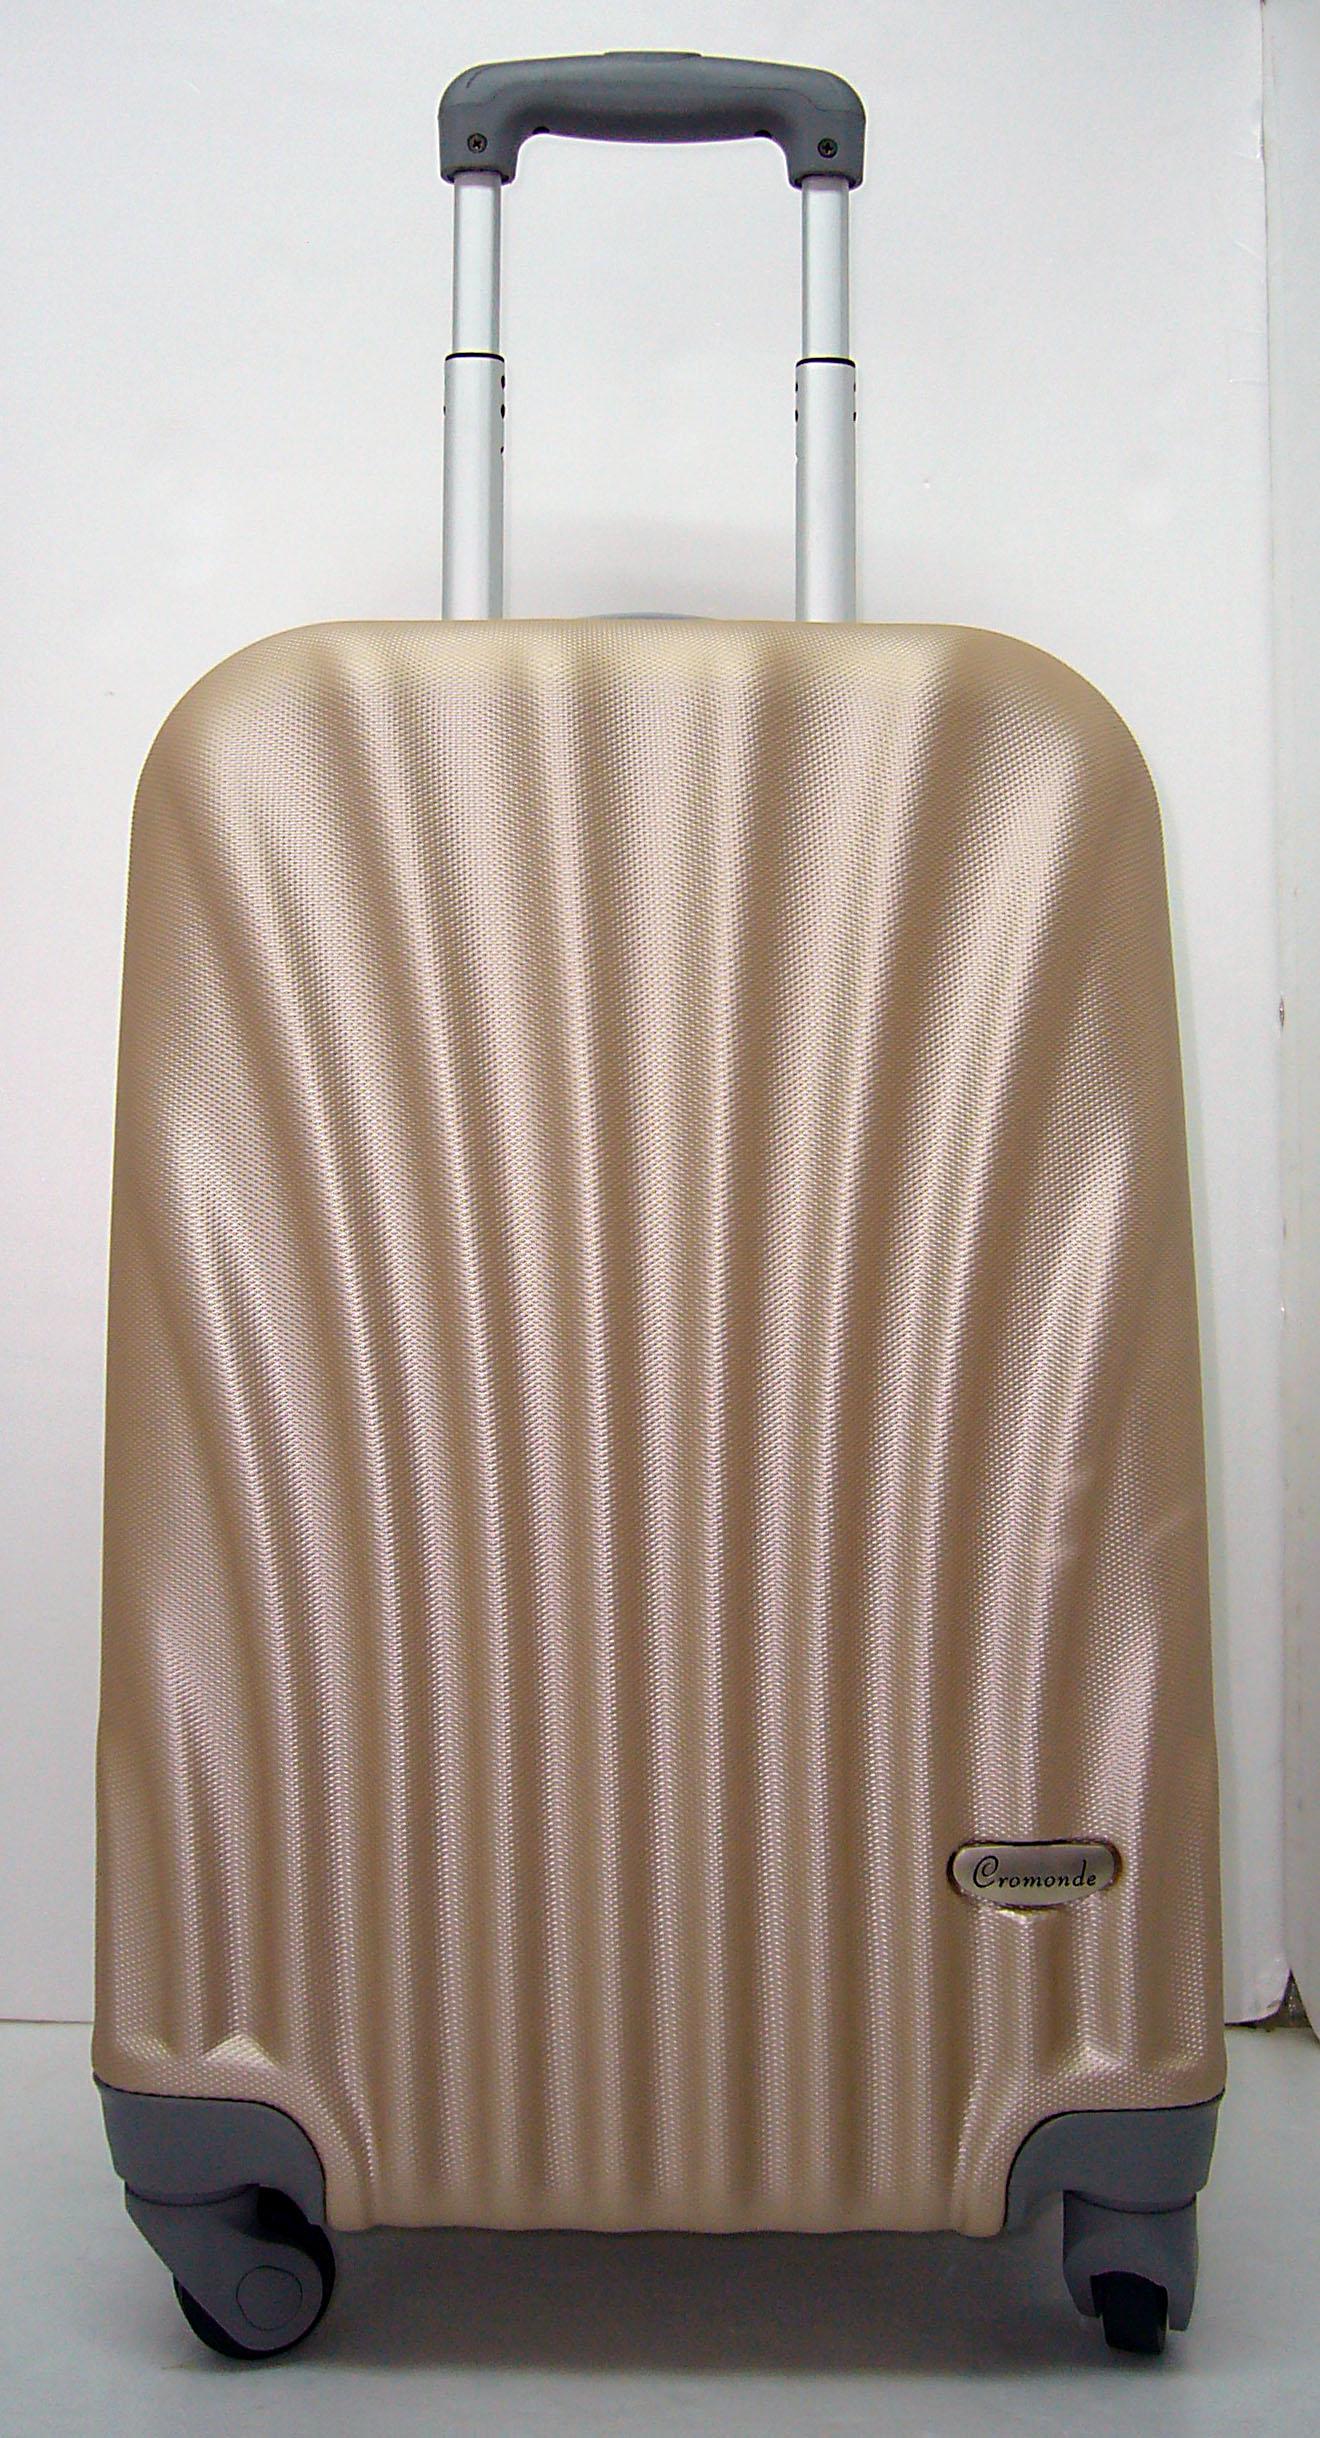 【SunEasy生活館】克洛蒙 24吋ABS登機行李箱-貝殼米金